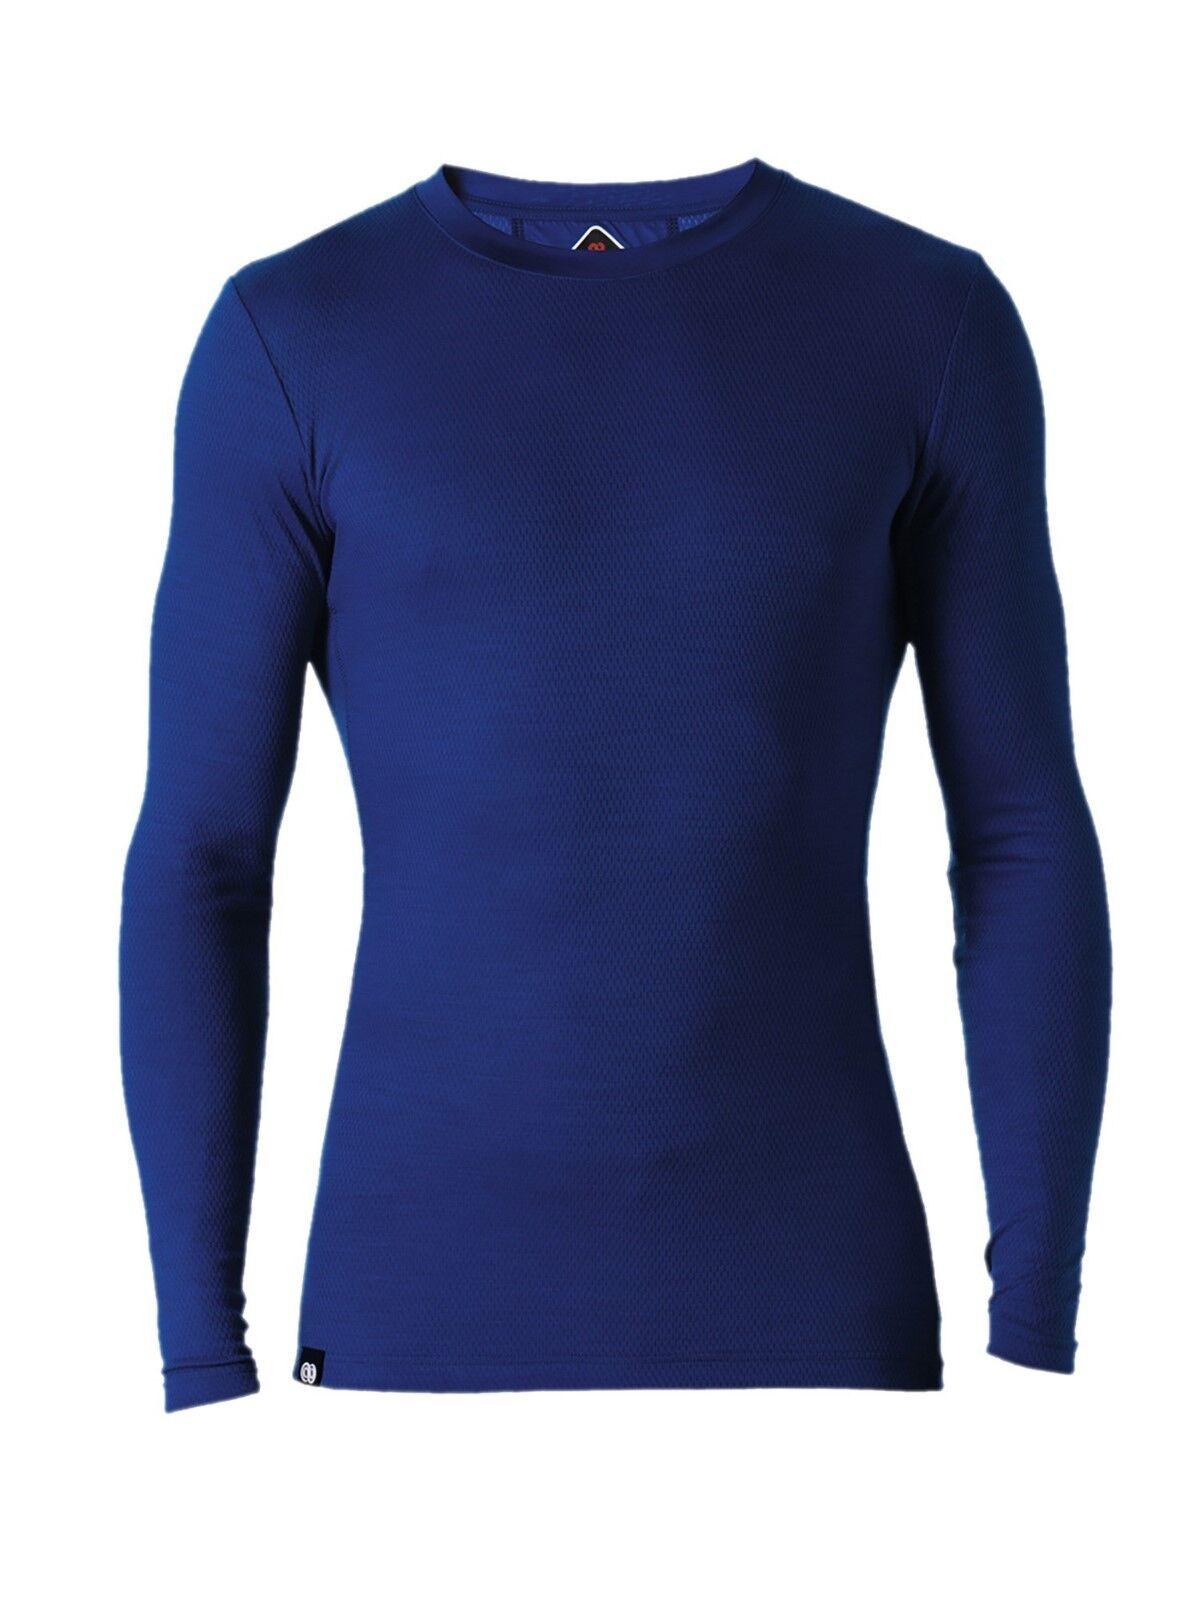 rougea REWOOLUTION furud-Men 's Mesh US T-shirt 180, Mérinos Laine, Royal